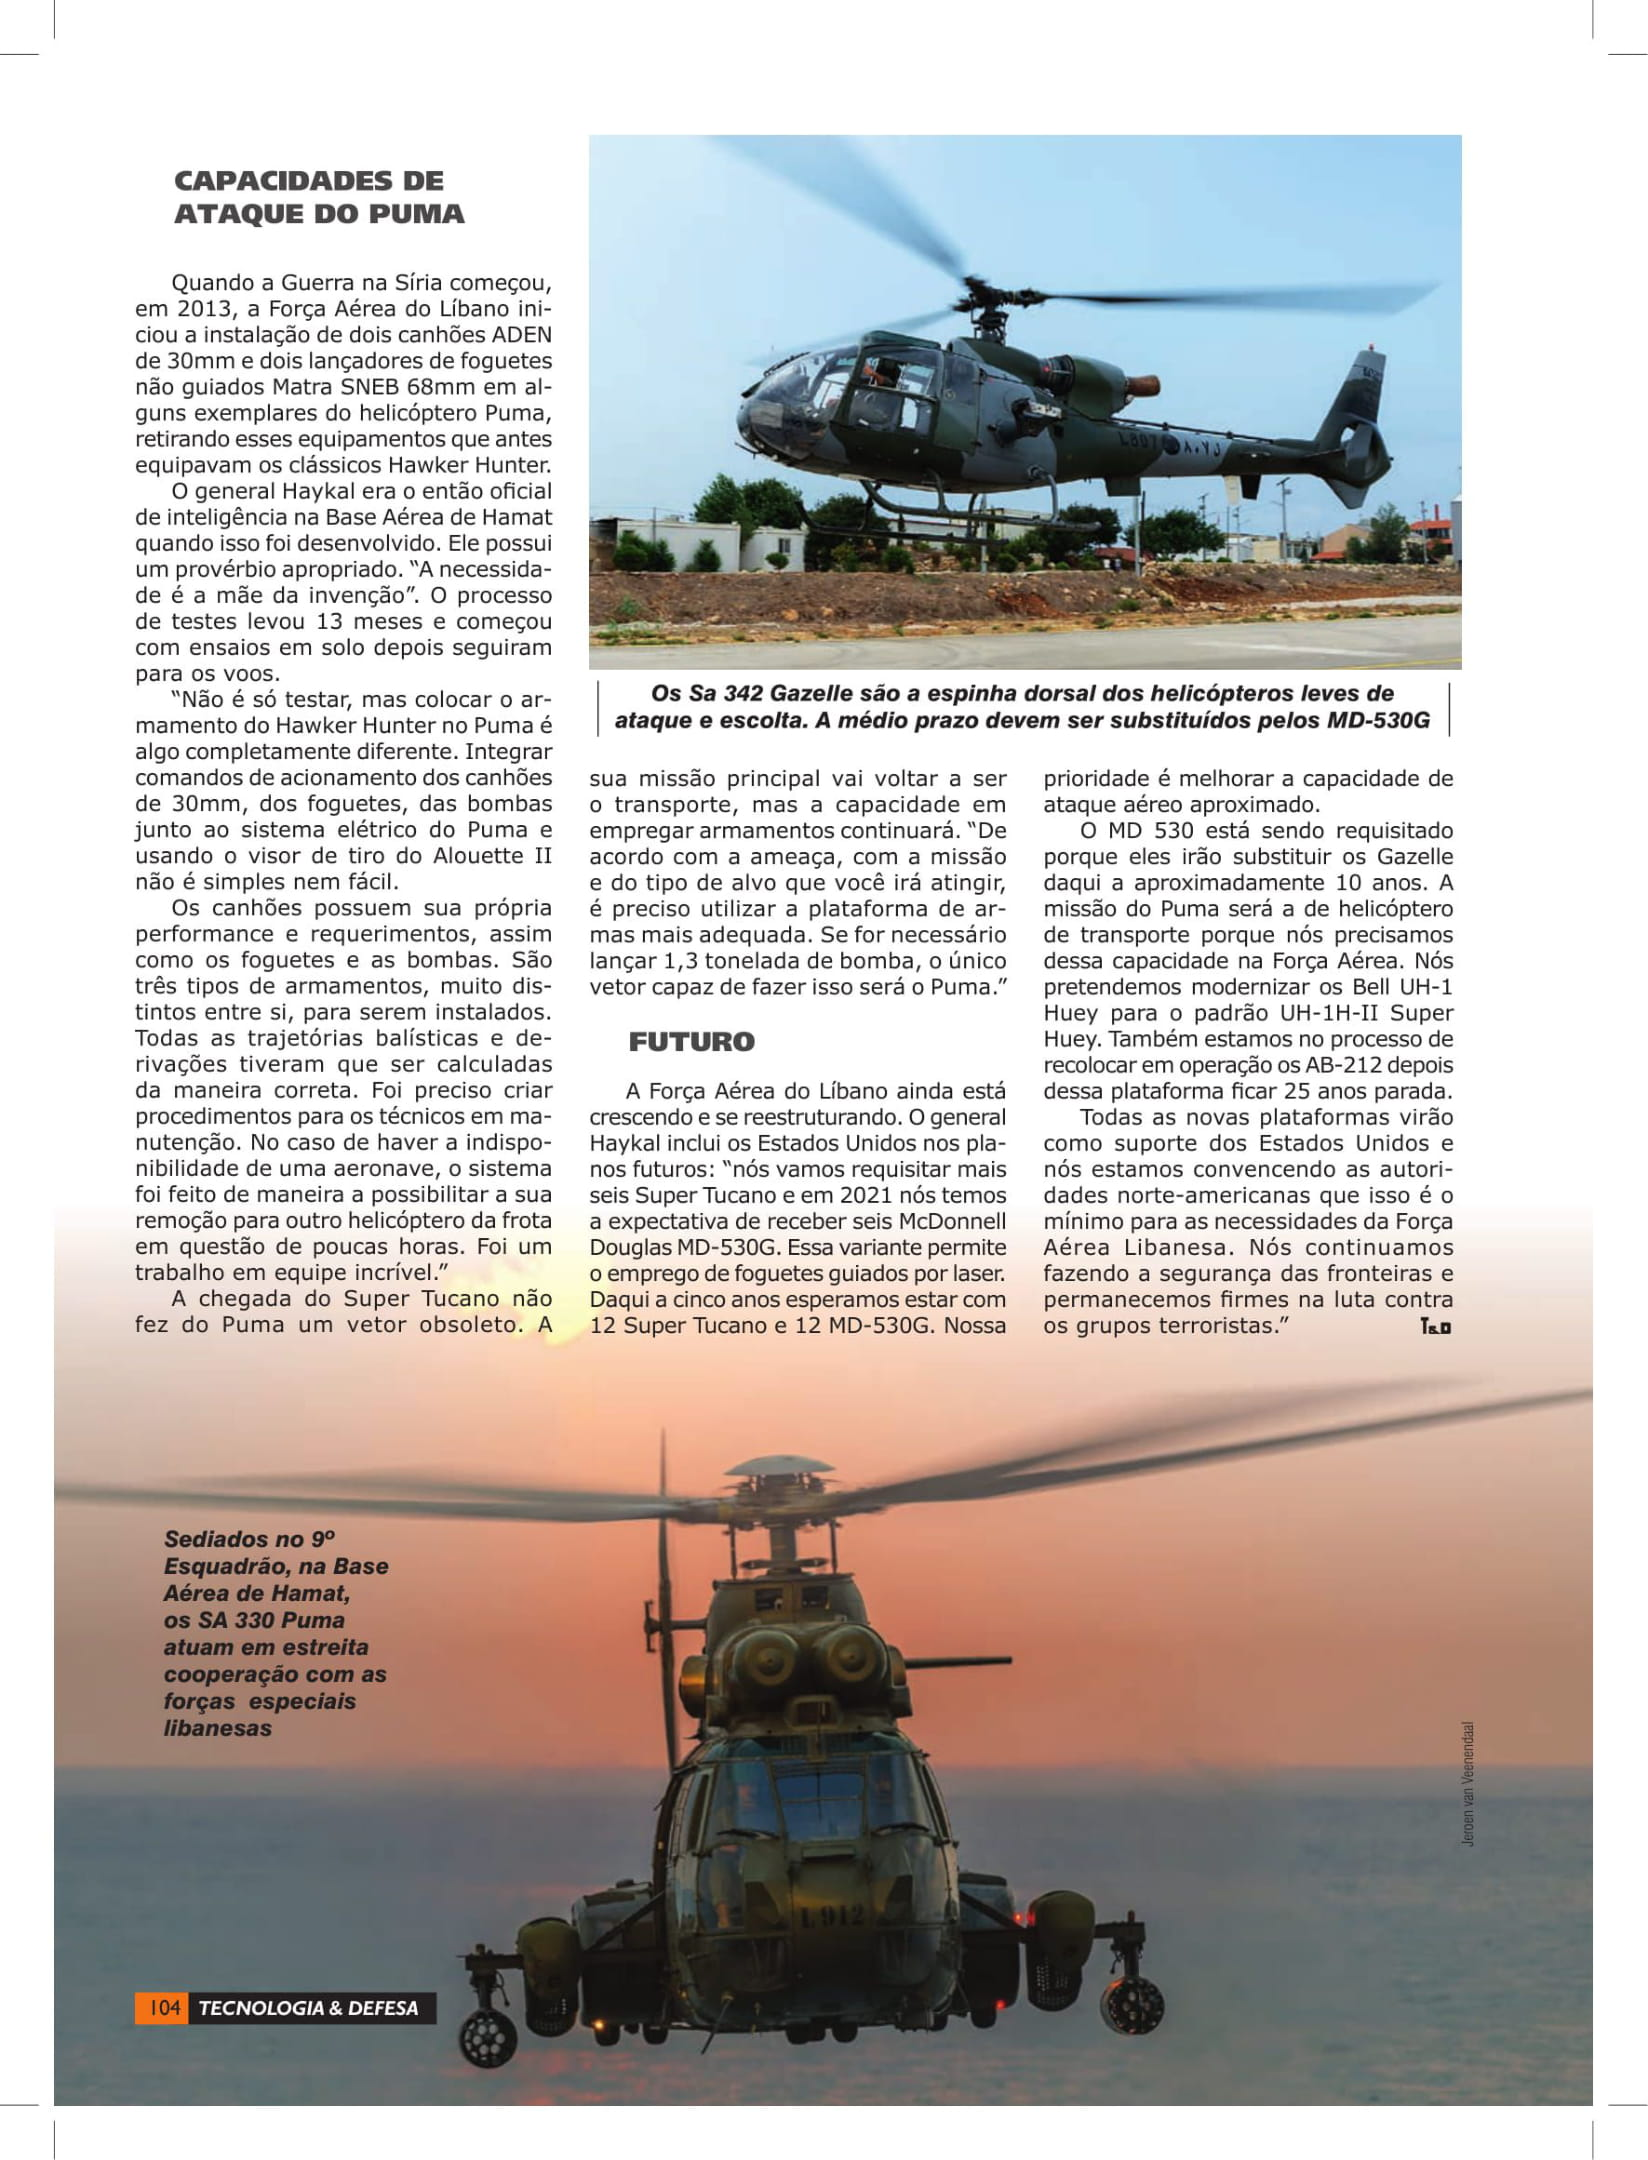 Tecnologia & Defesa (Brazil)_Lebanese Air Force-8